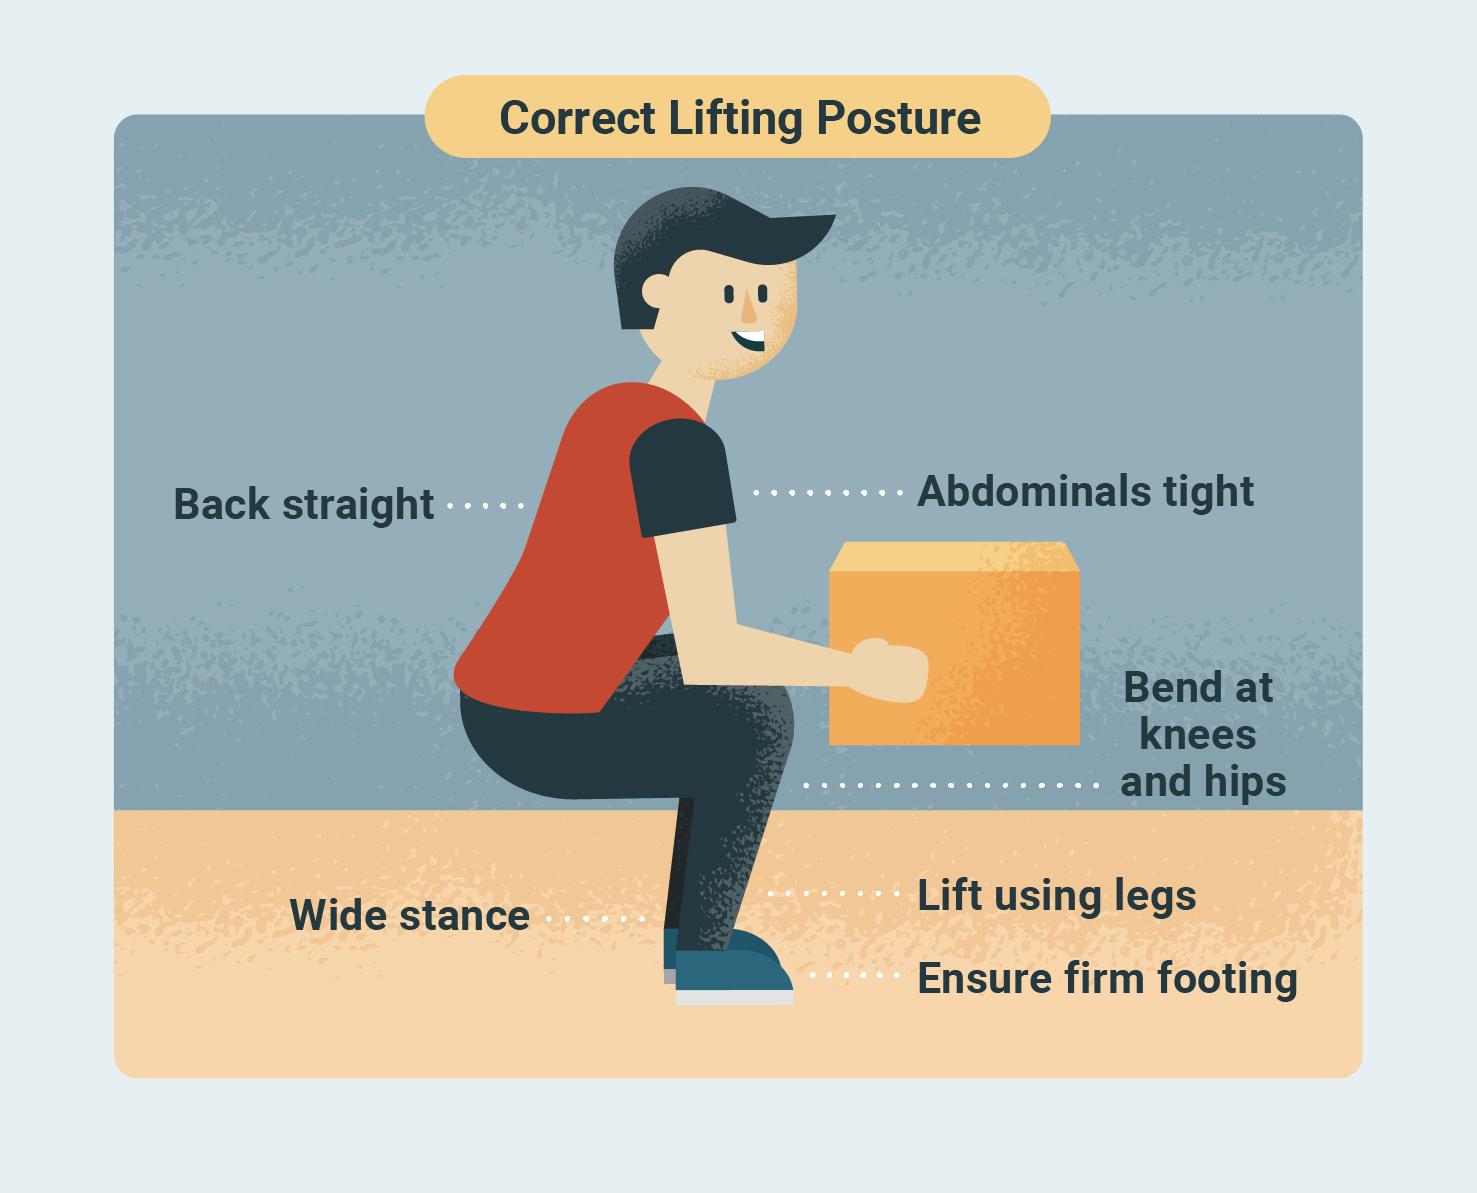 illustration correct lifting posture